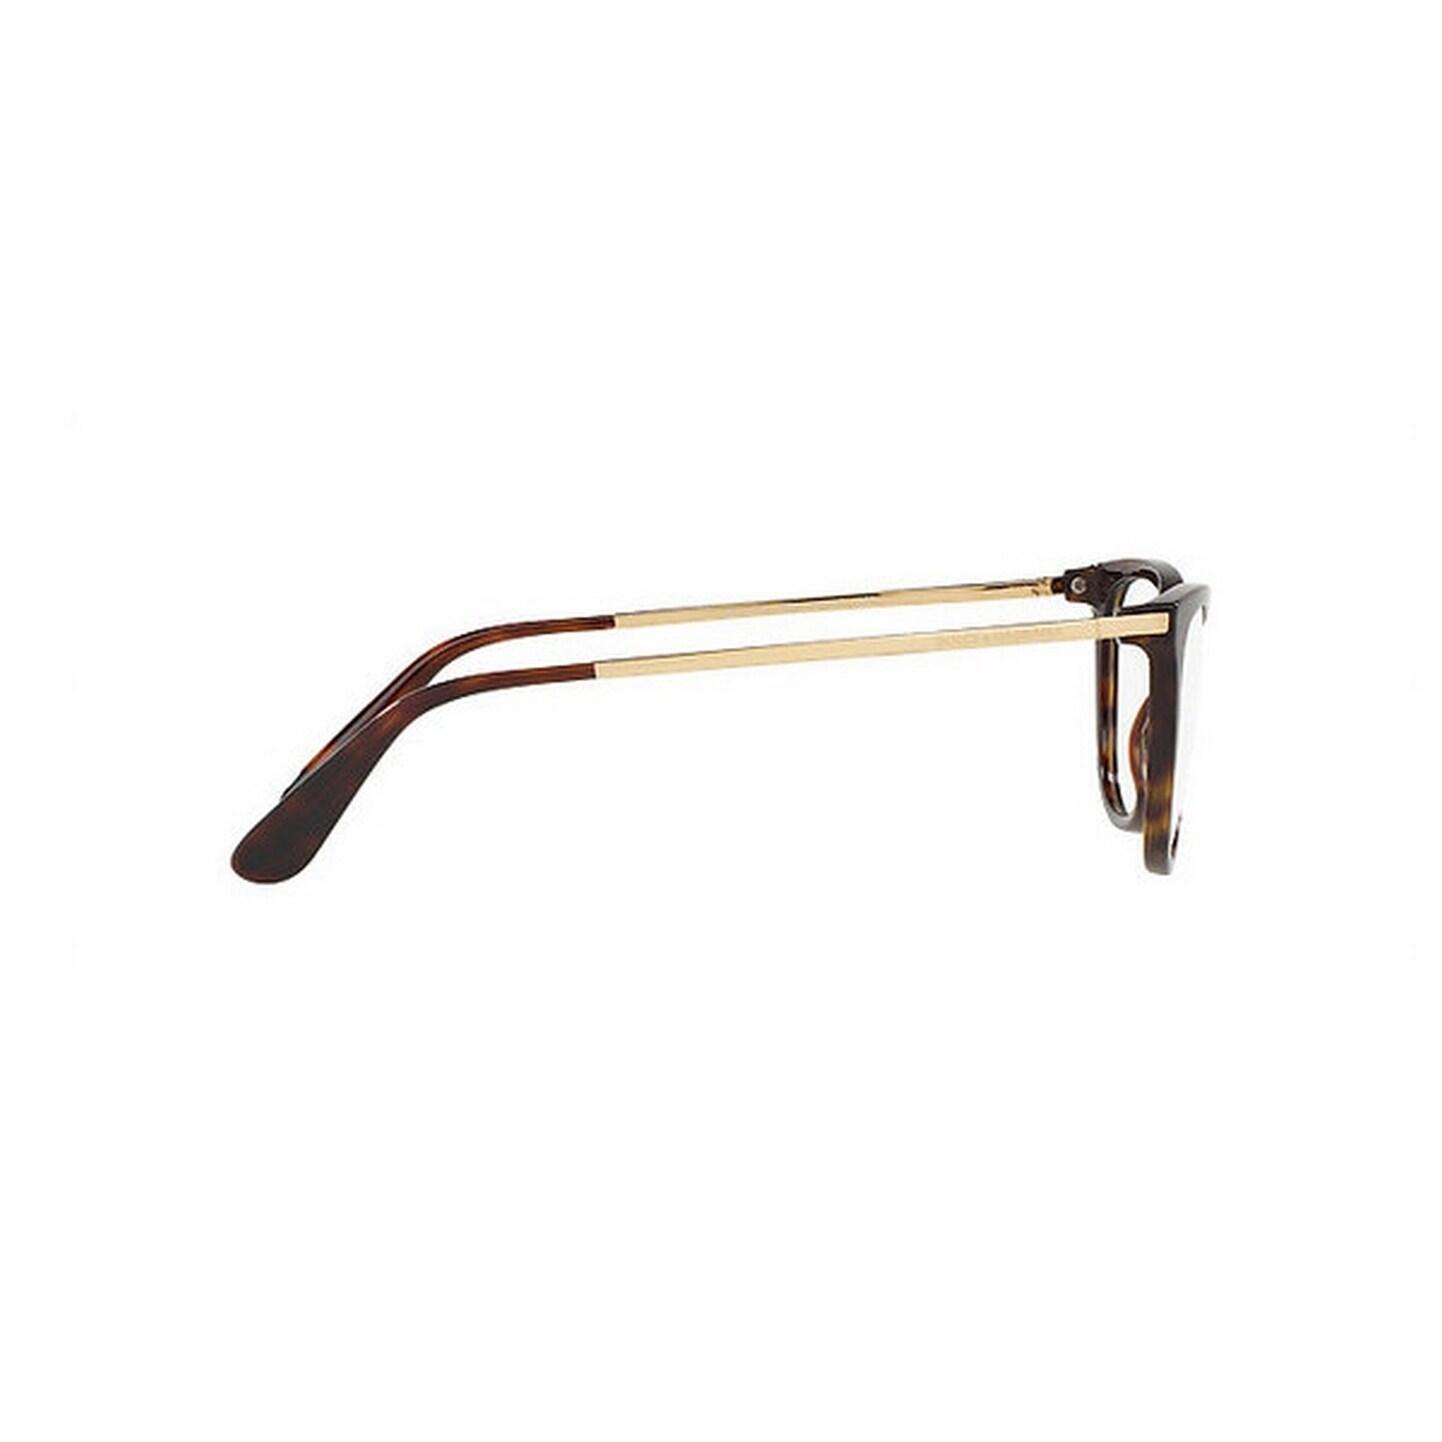 c138fe8a1c2 Shop Dolce   Gabbana Women s DG3258 502 54 Cateye Plastic Havana Clear  Eyeglasses - Free Shipping Today - Overstock - 14791058